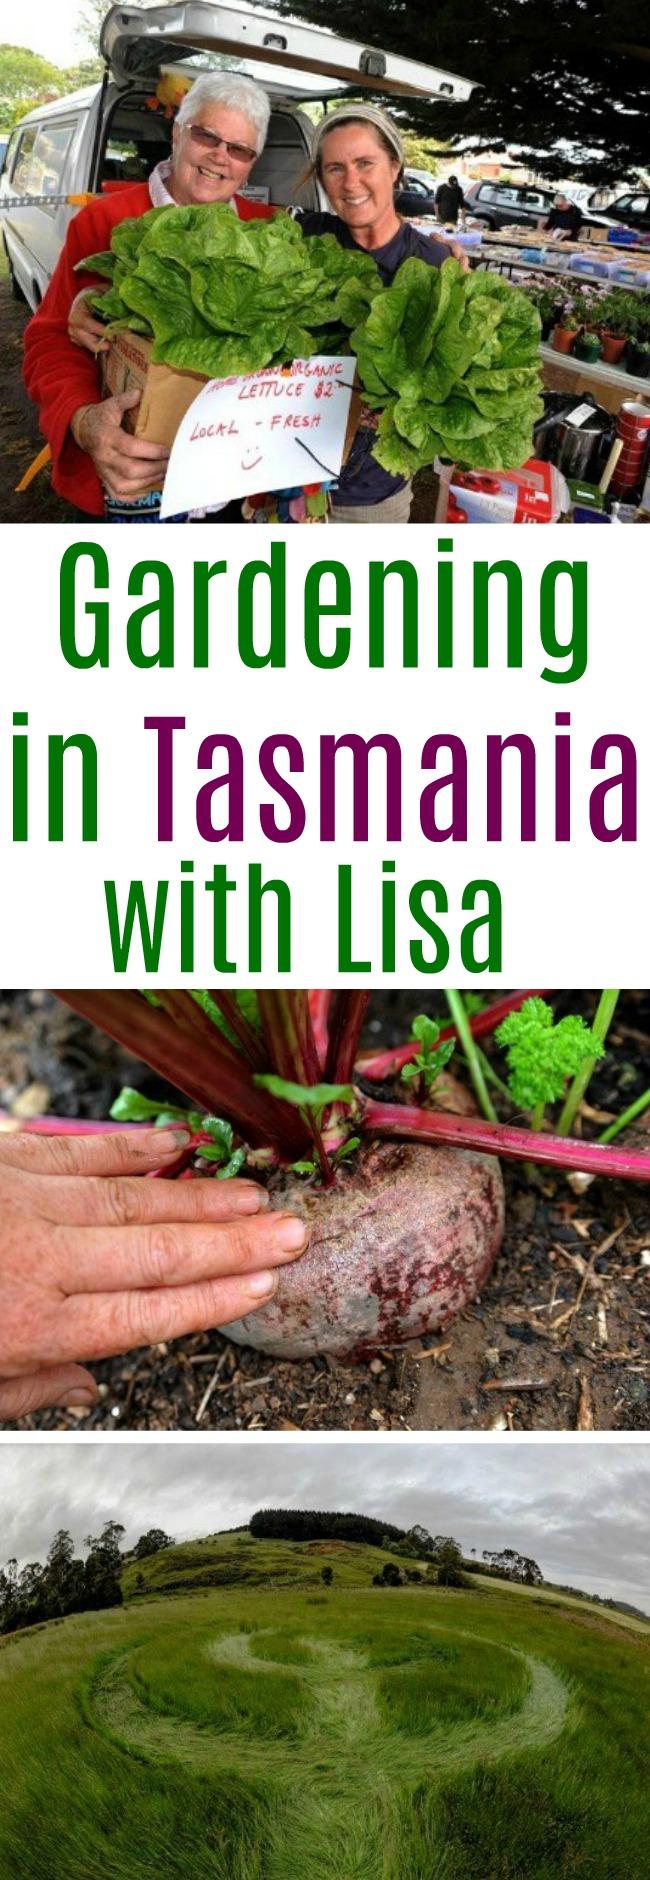 Lisa From Tasmania Shares Her Garden Photos With Us